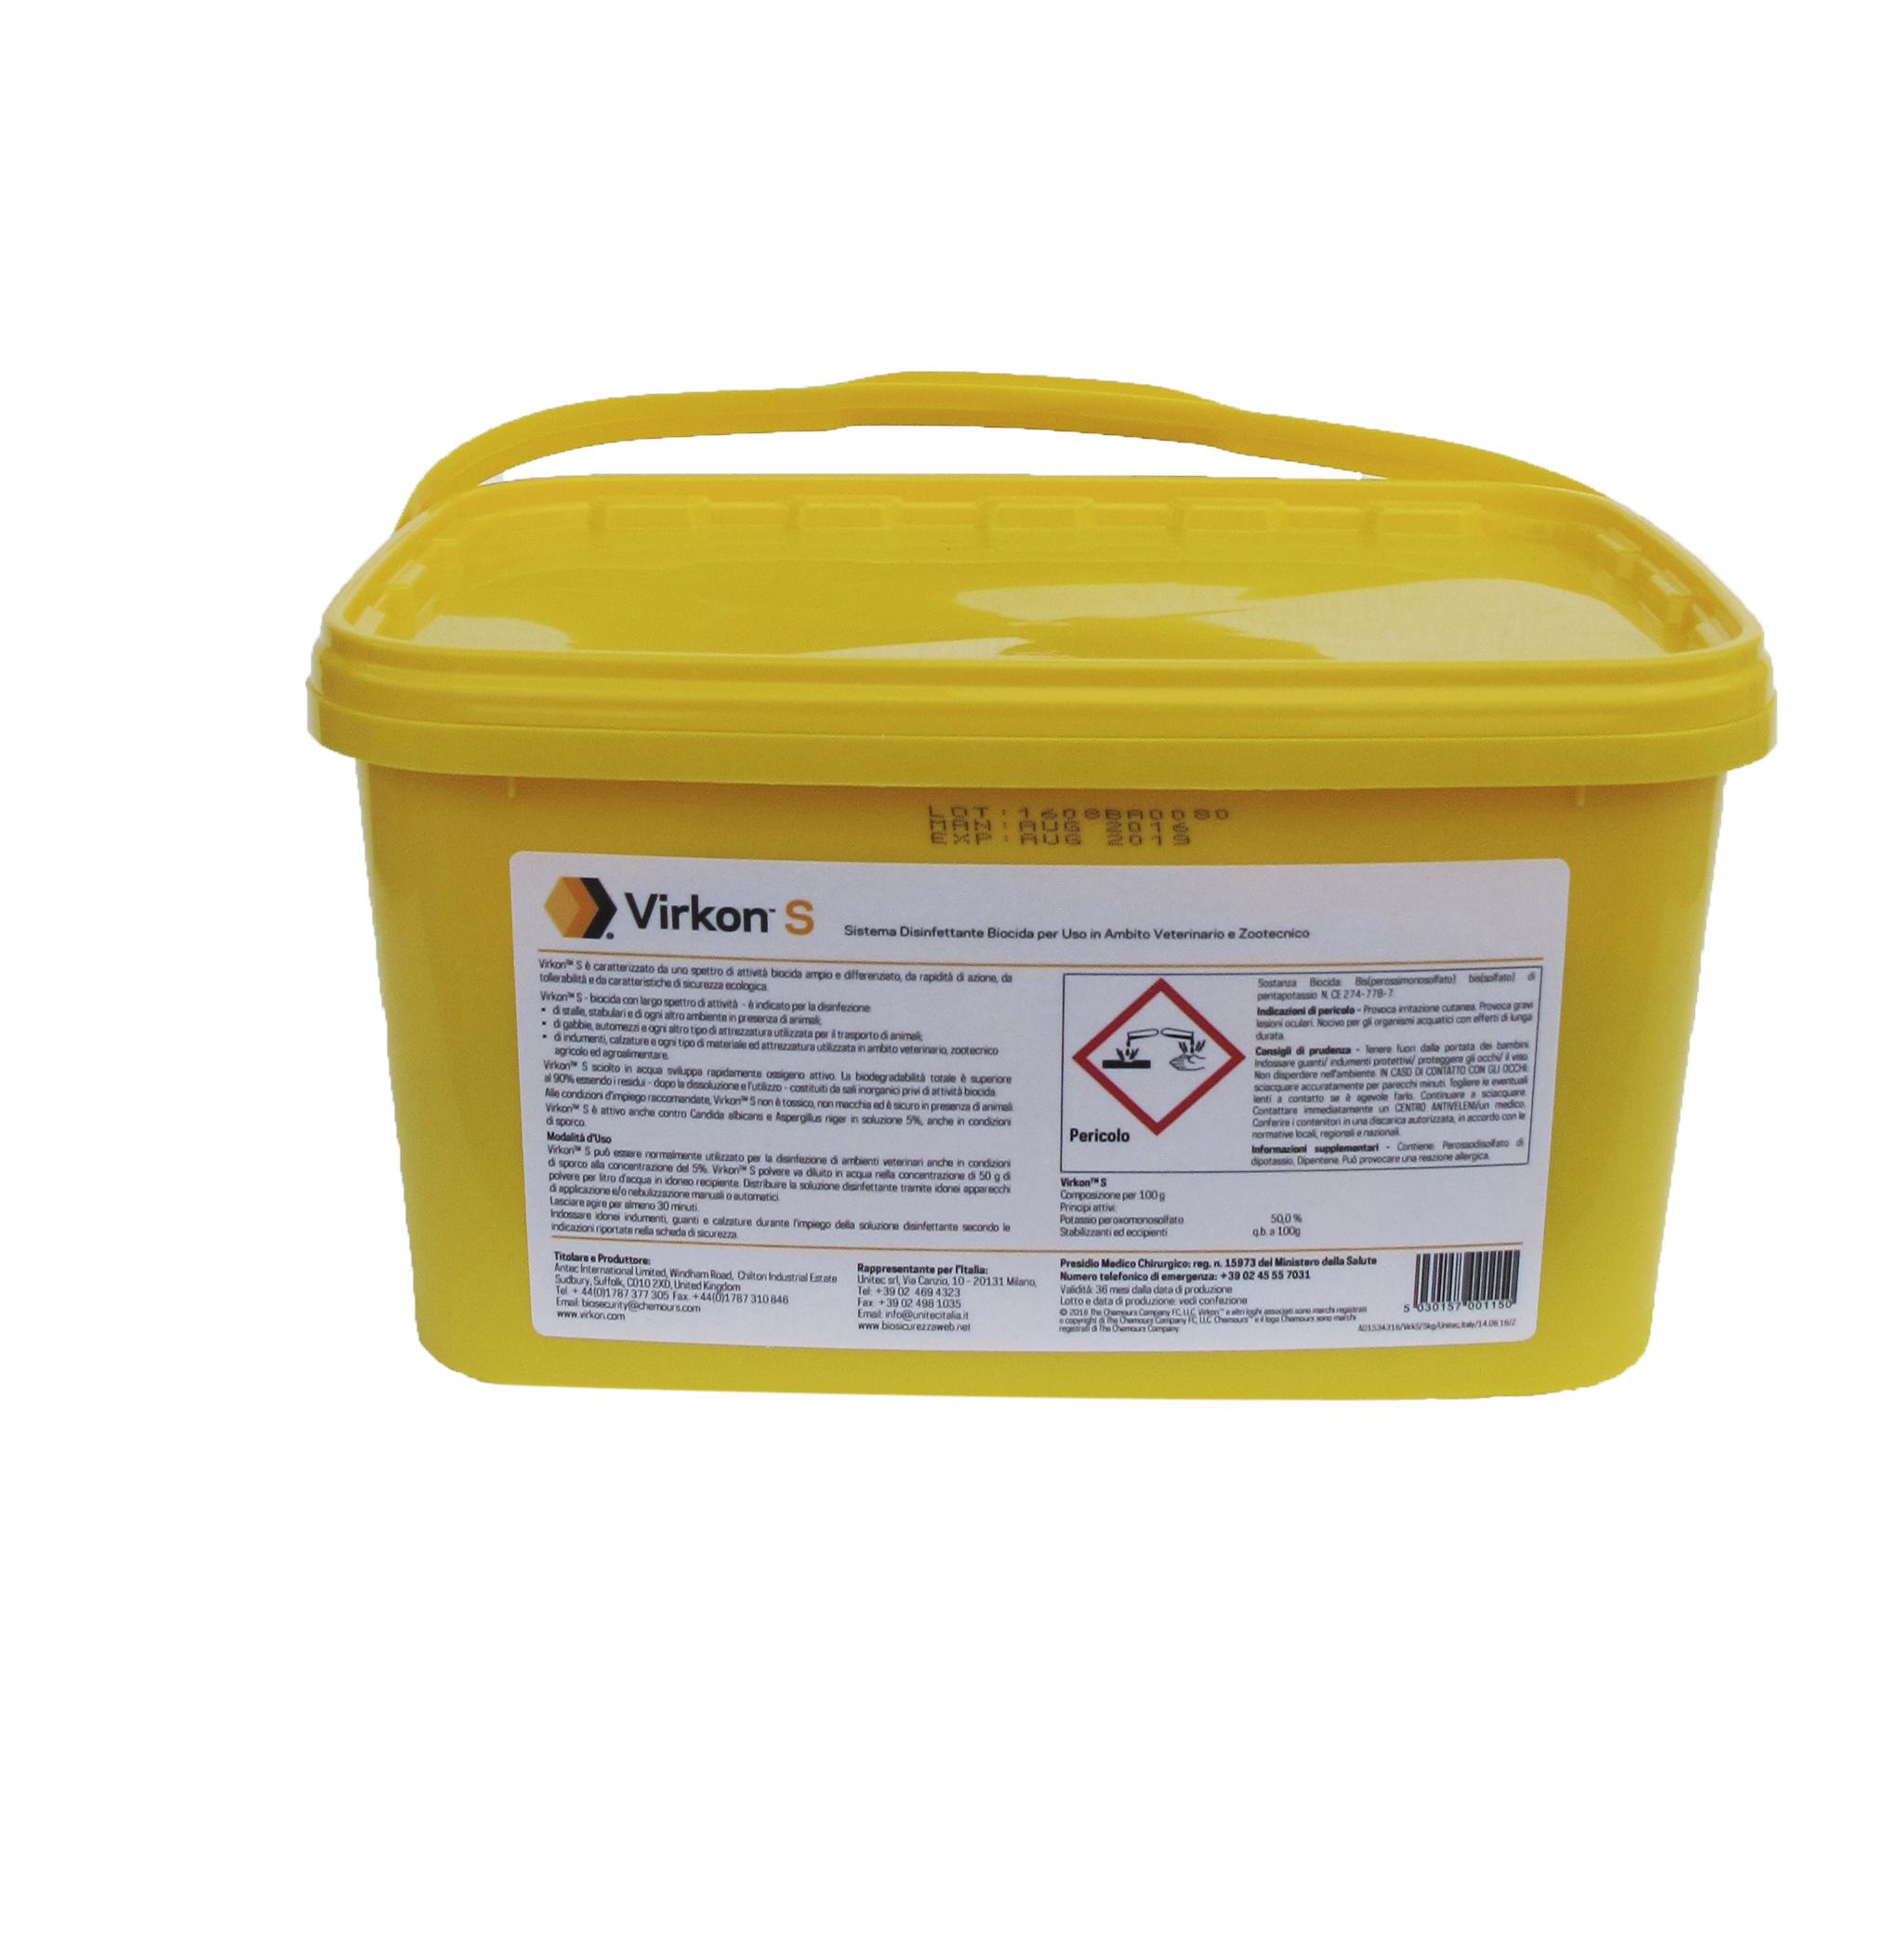 Image of VirkonS Disinfettante in Polvere 5kg 907697799